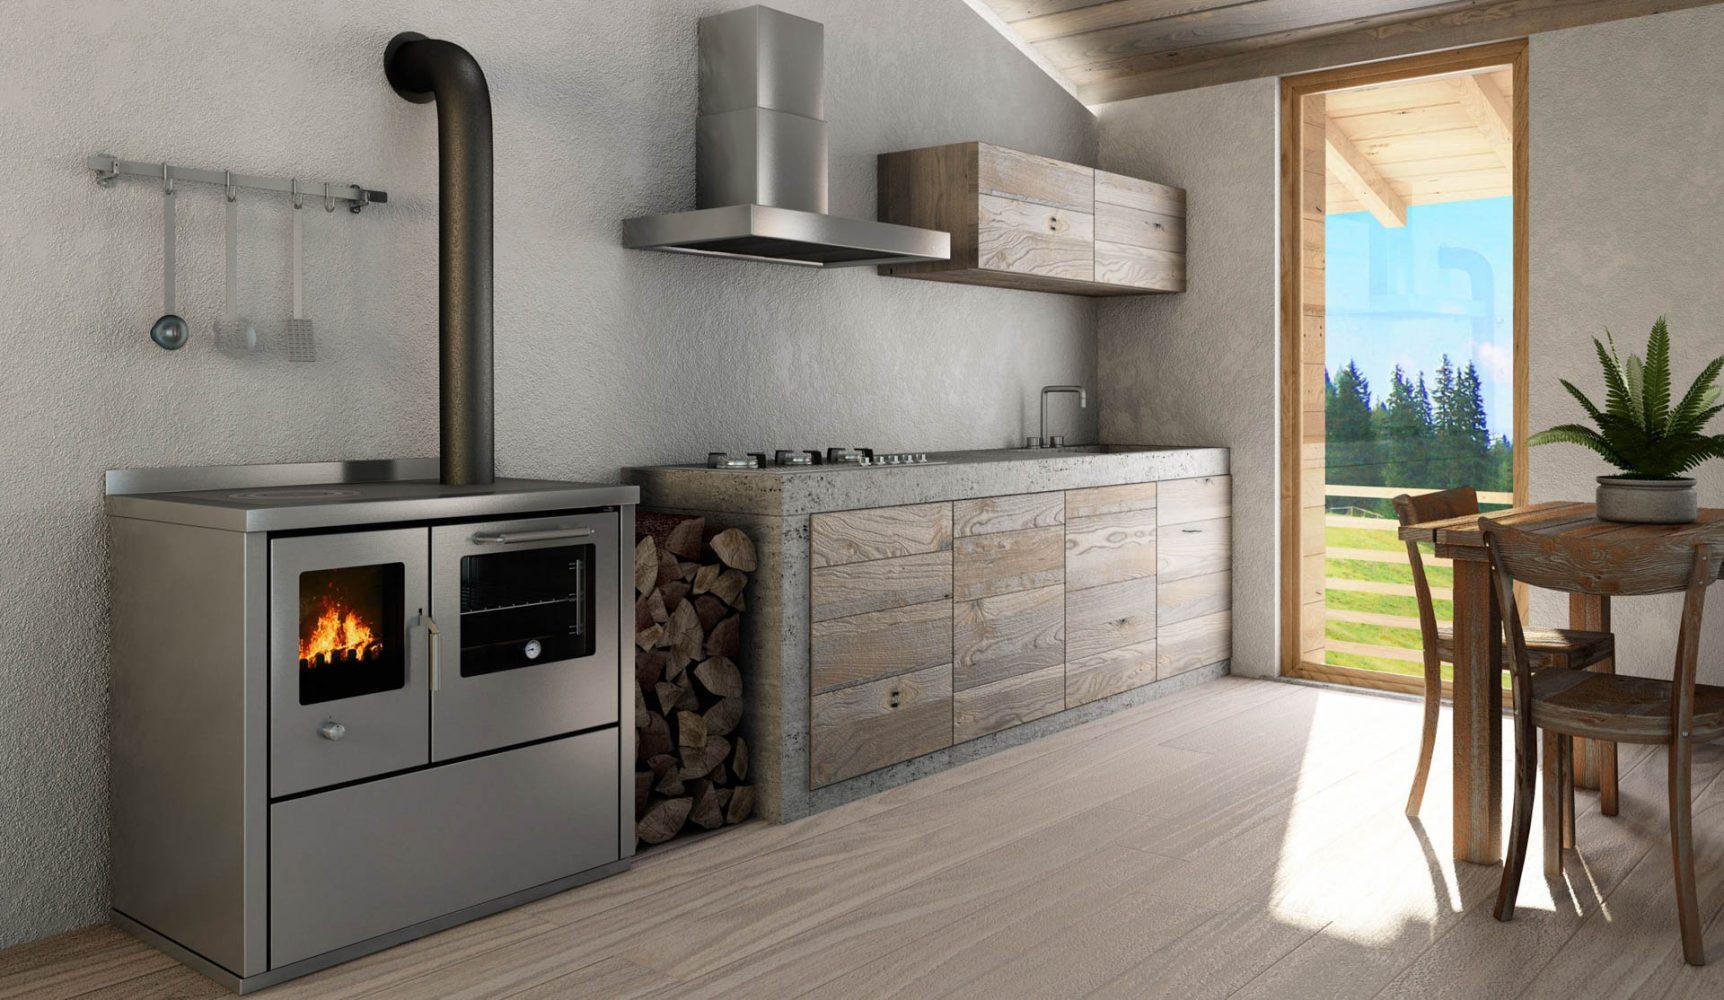 Cucina economica a legna Pertinger Okoalpin | Camini e stufe ...